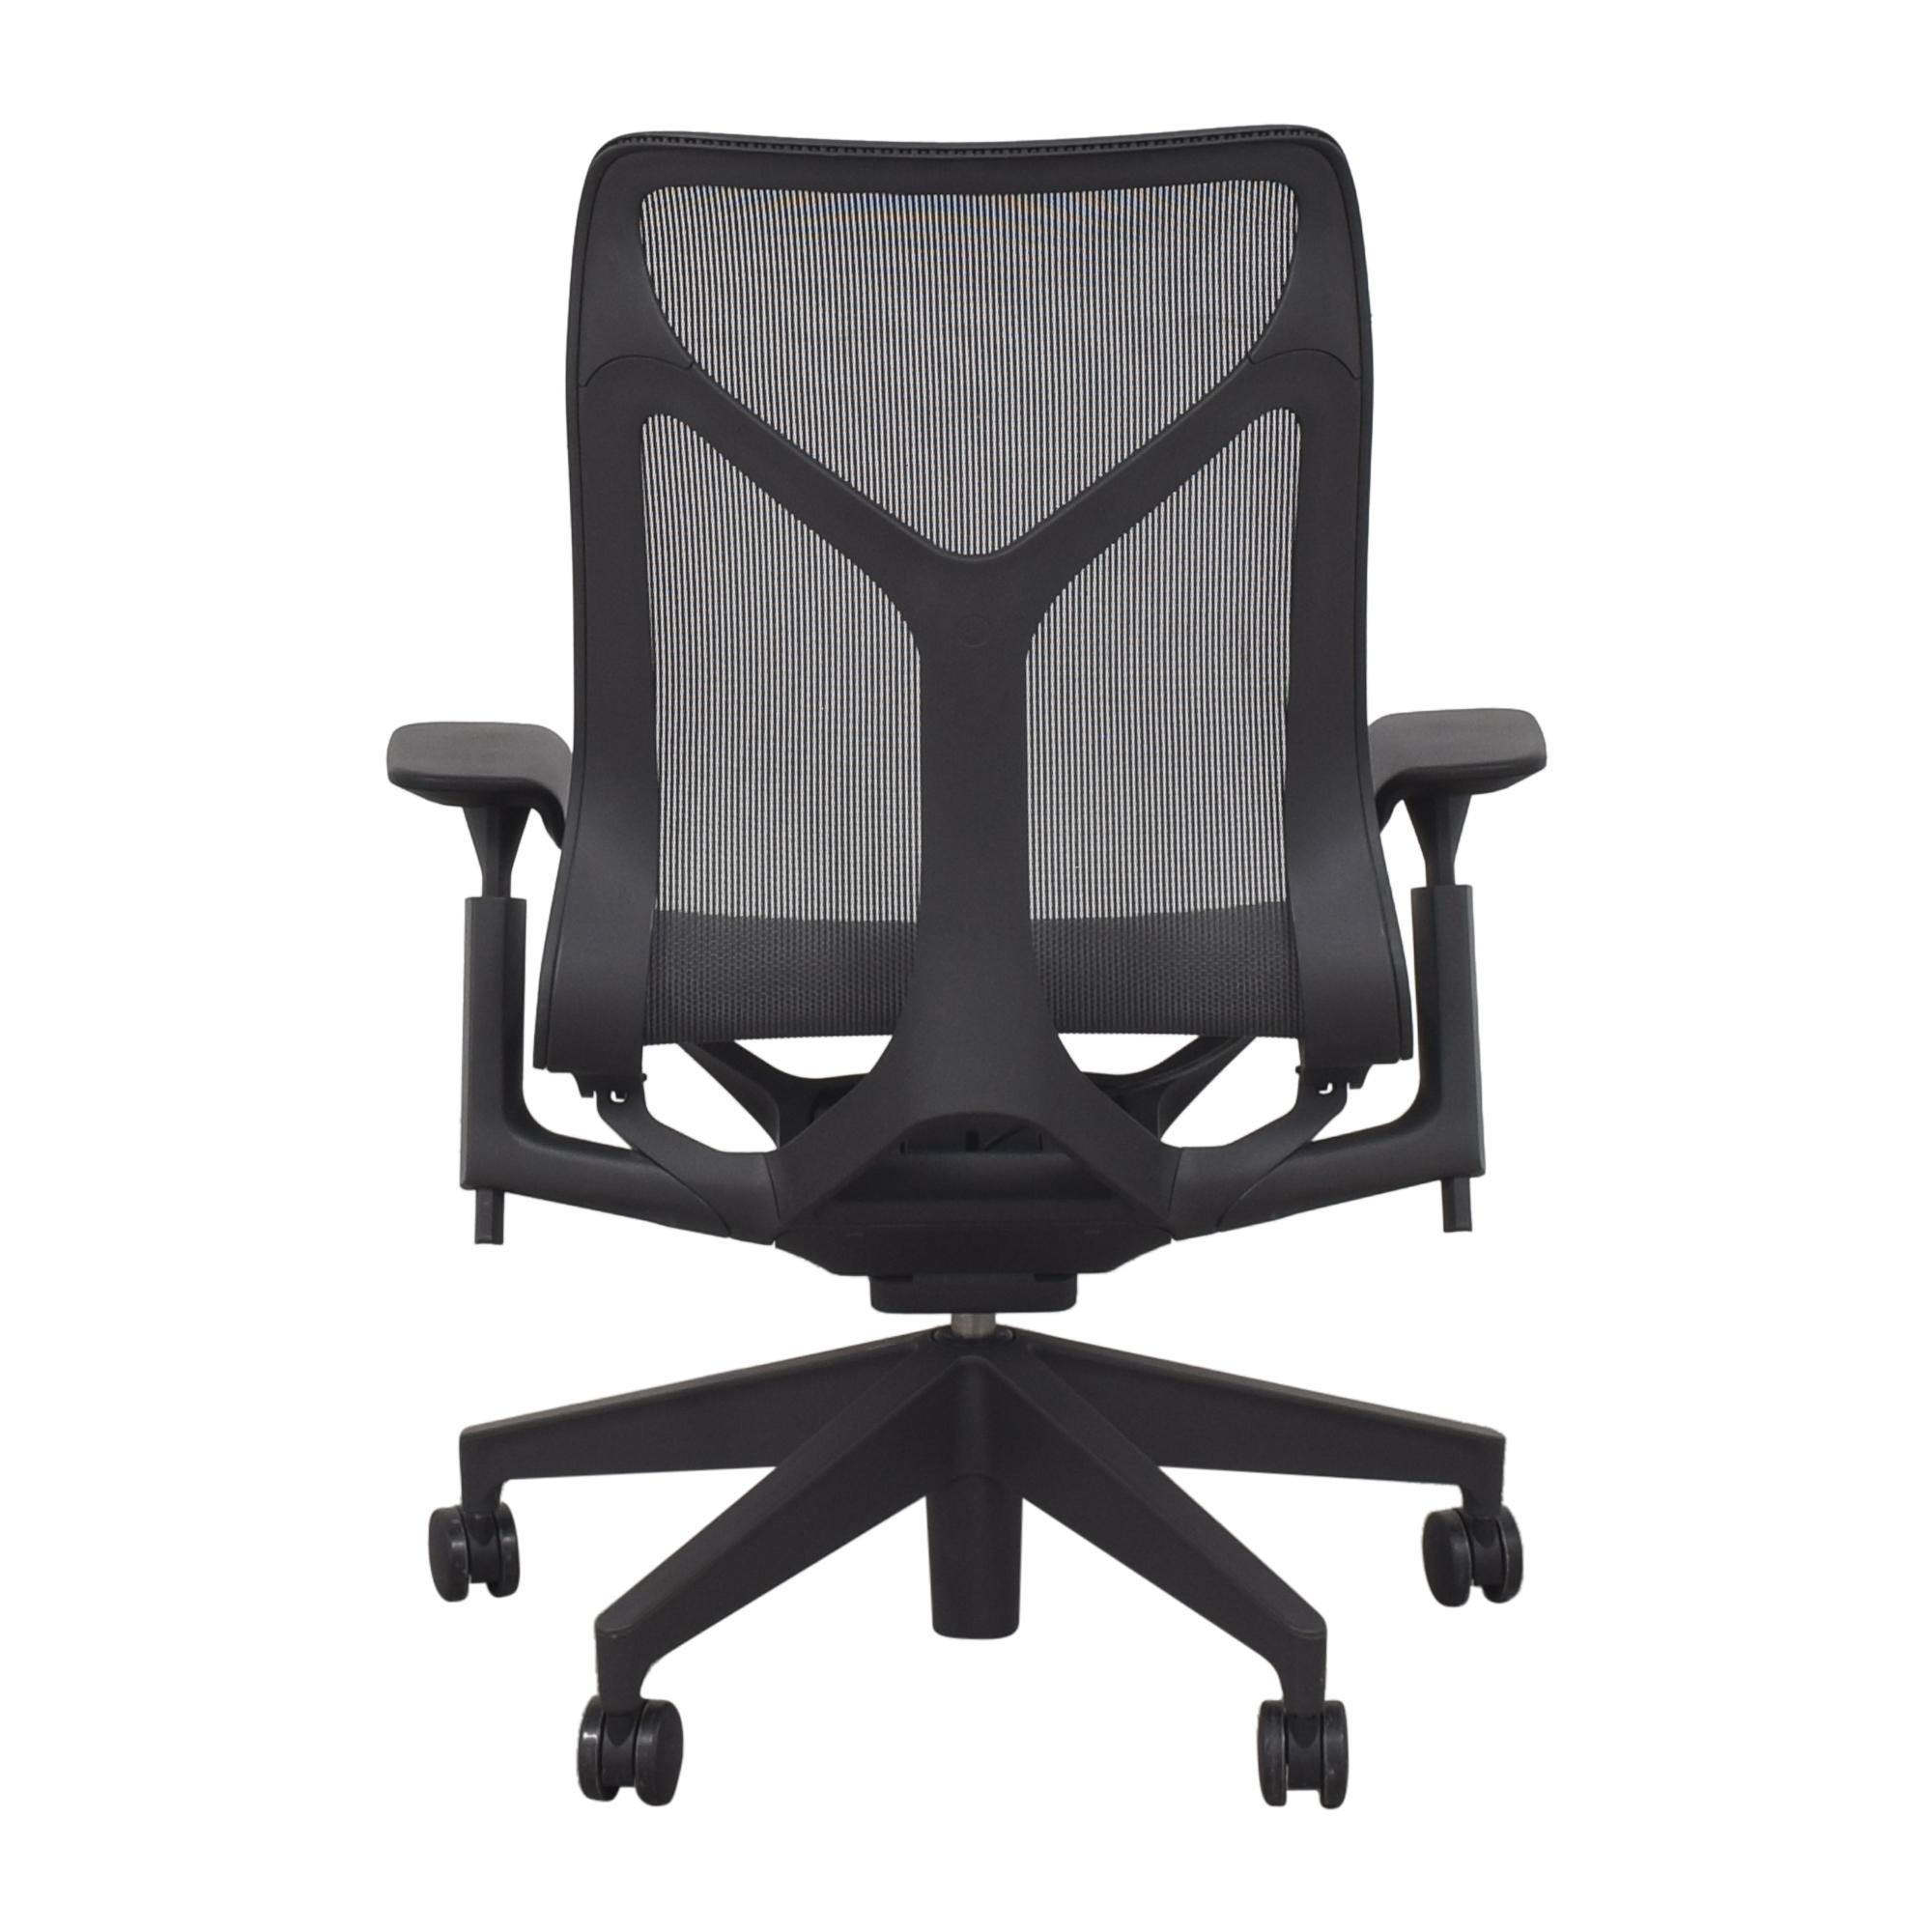 Herman Miller Herman Miller Cosm Chair pa